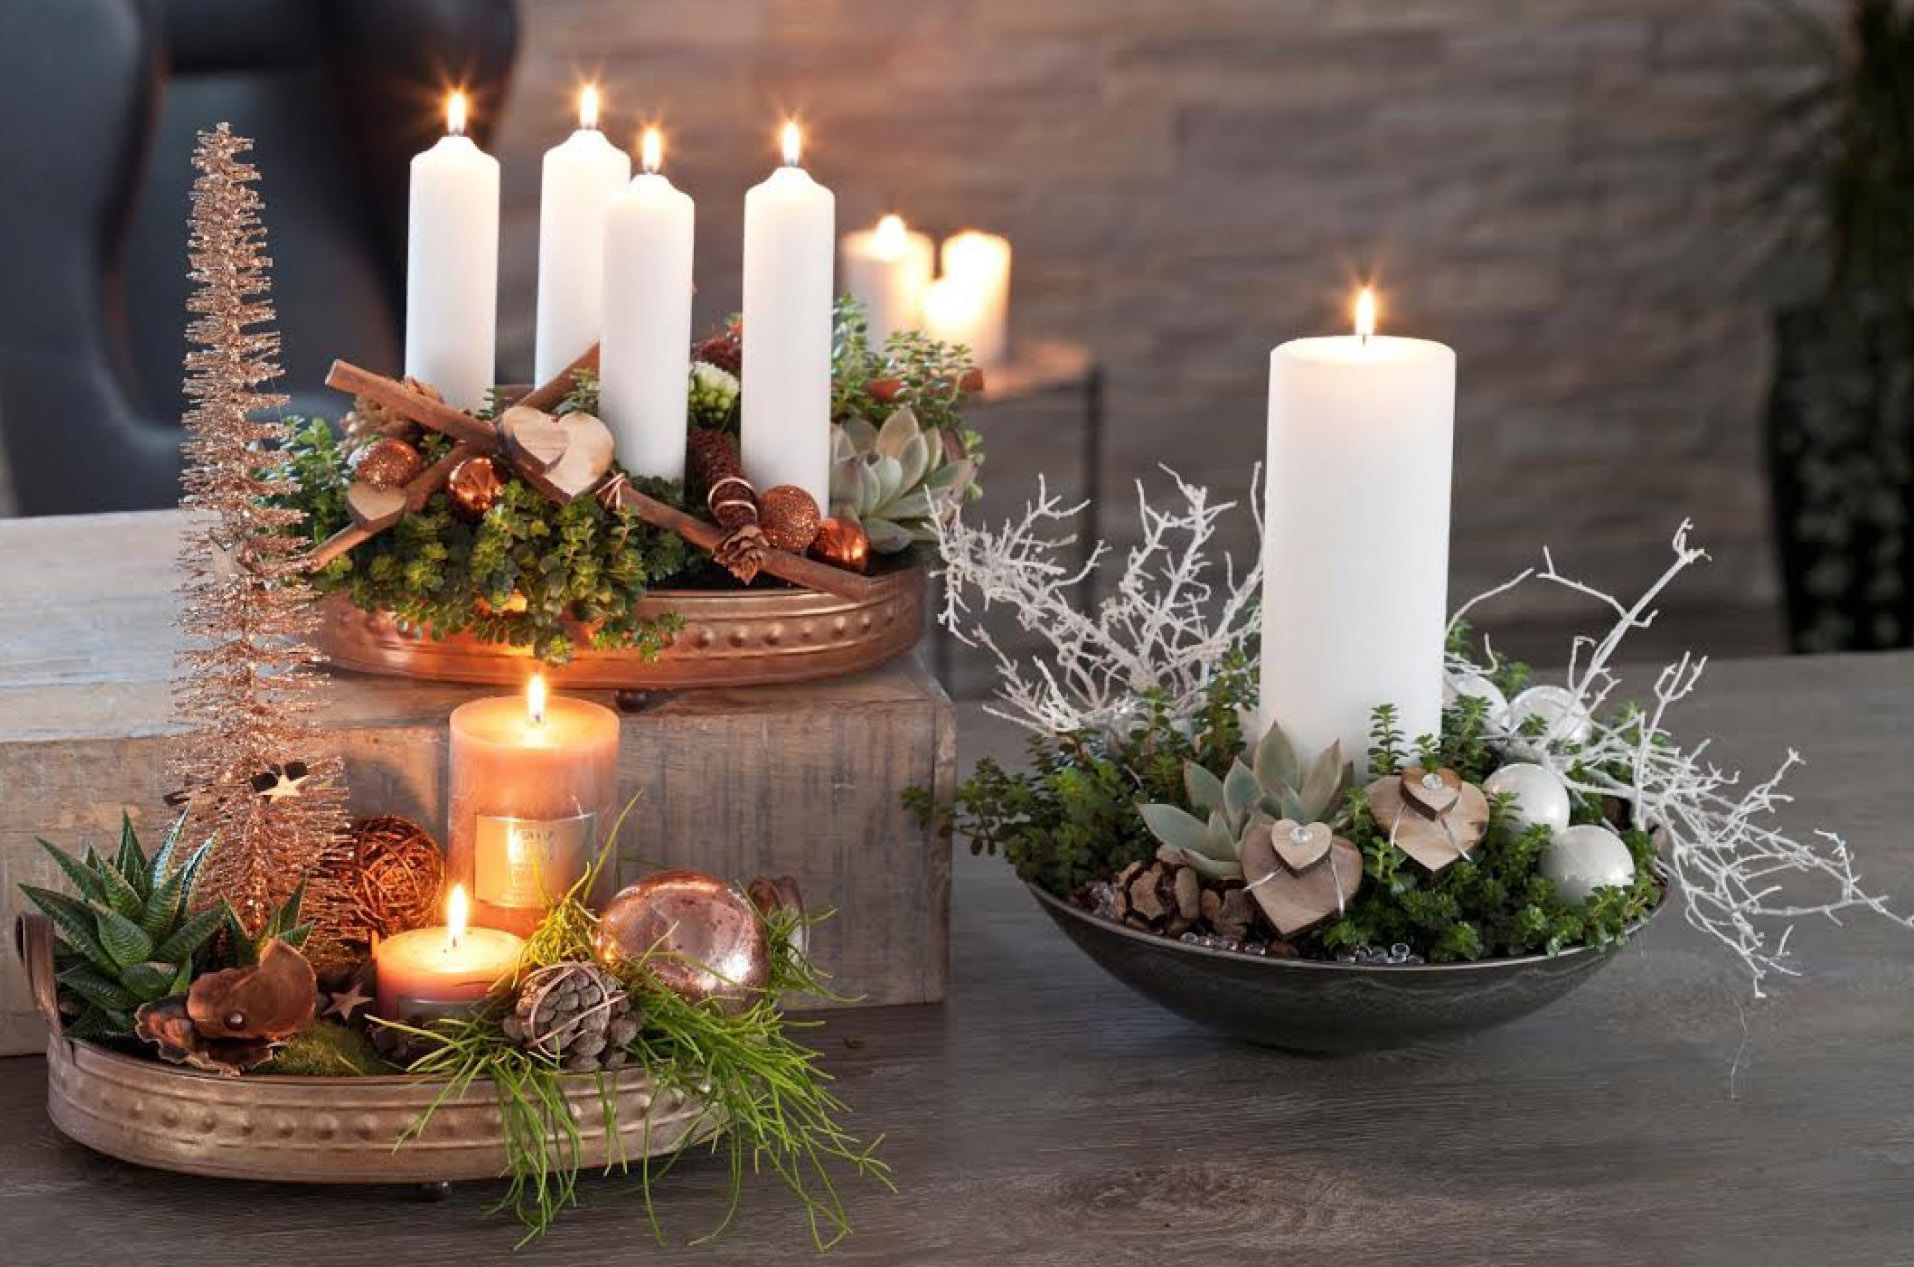 Advent & Jule dekorationer